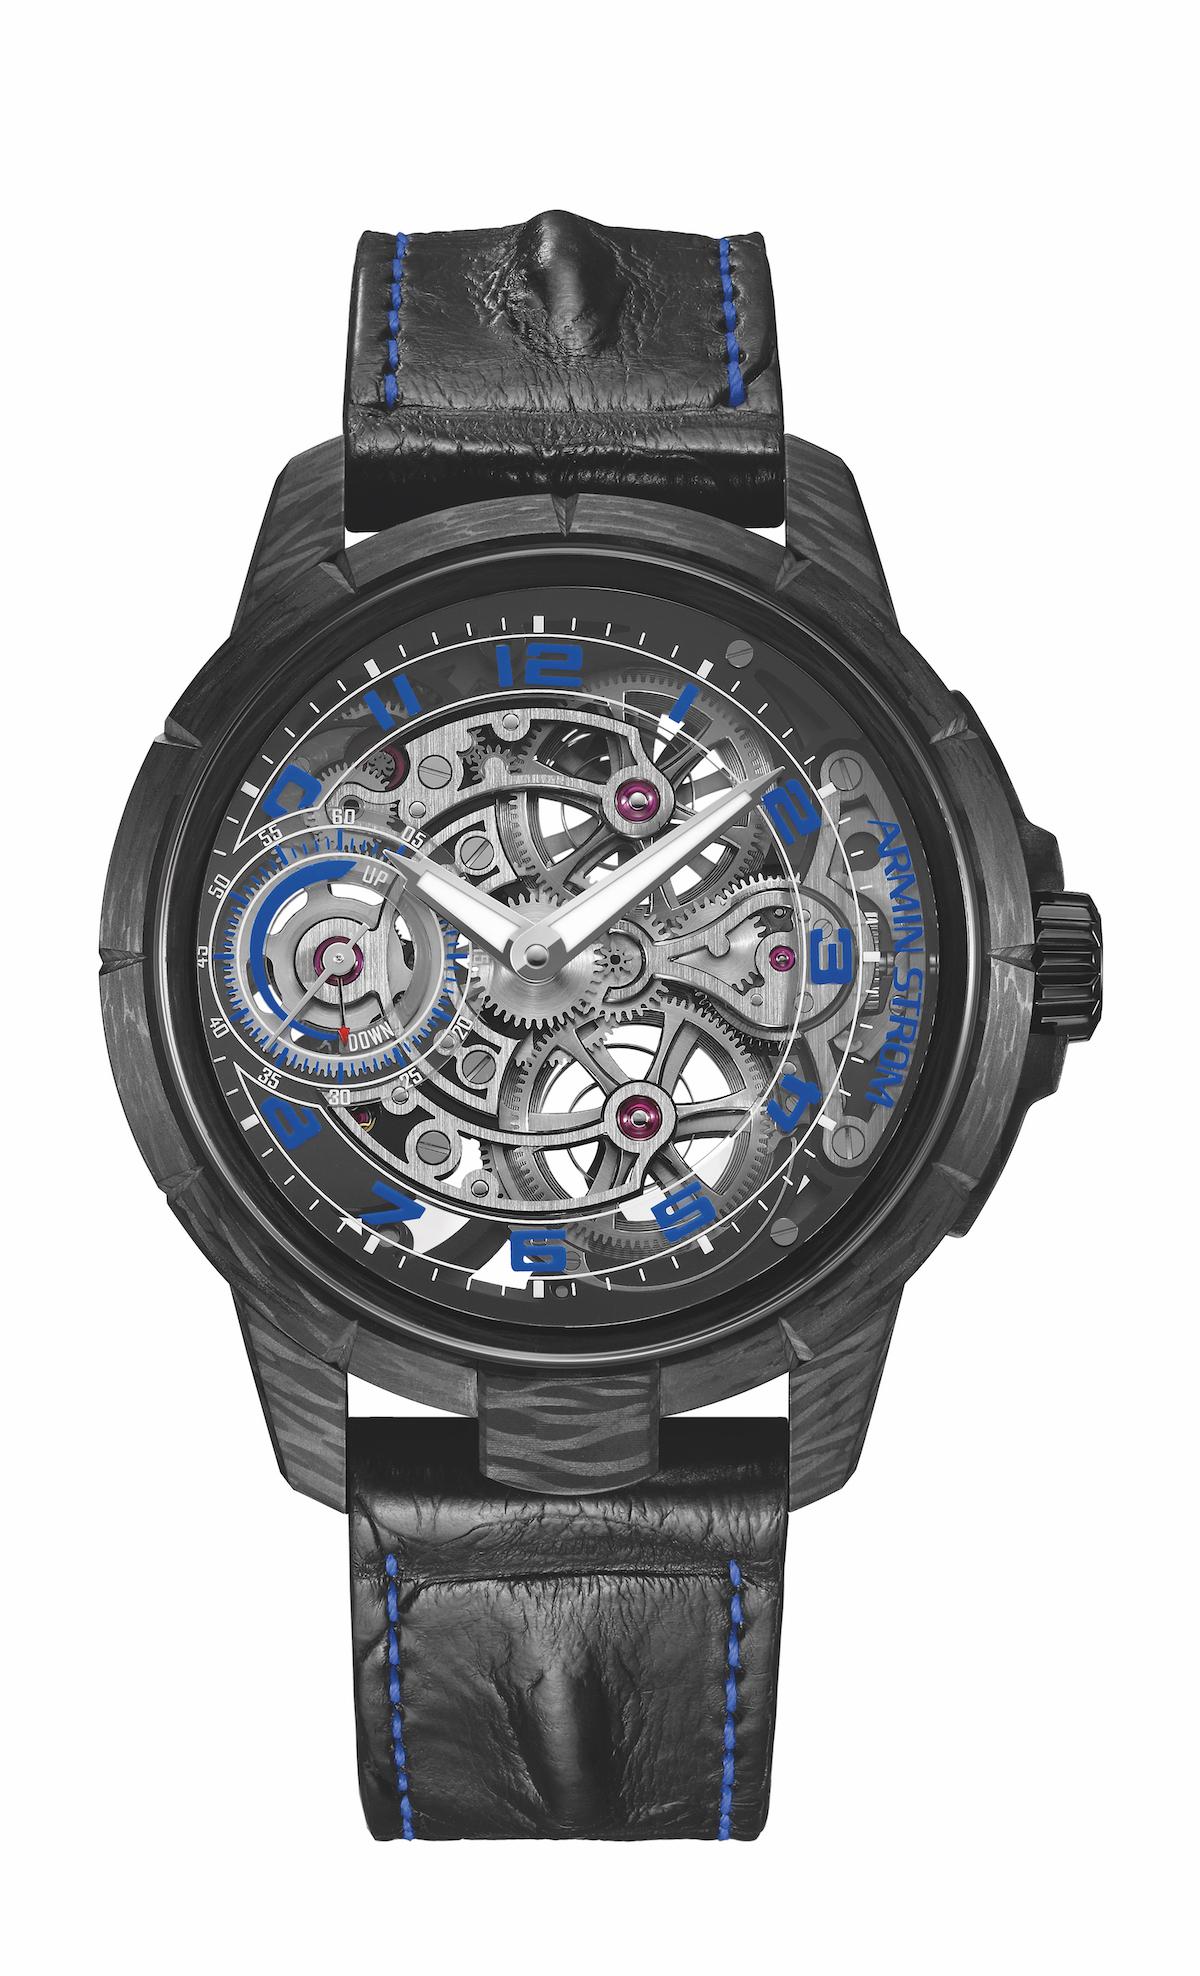 Armin Strom Skeleton Carbon watches